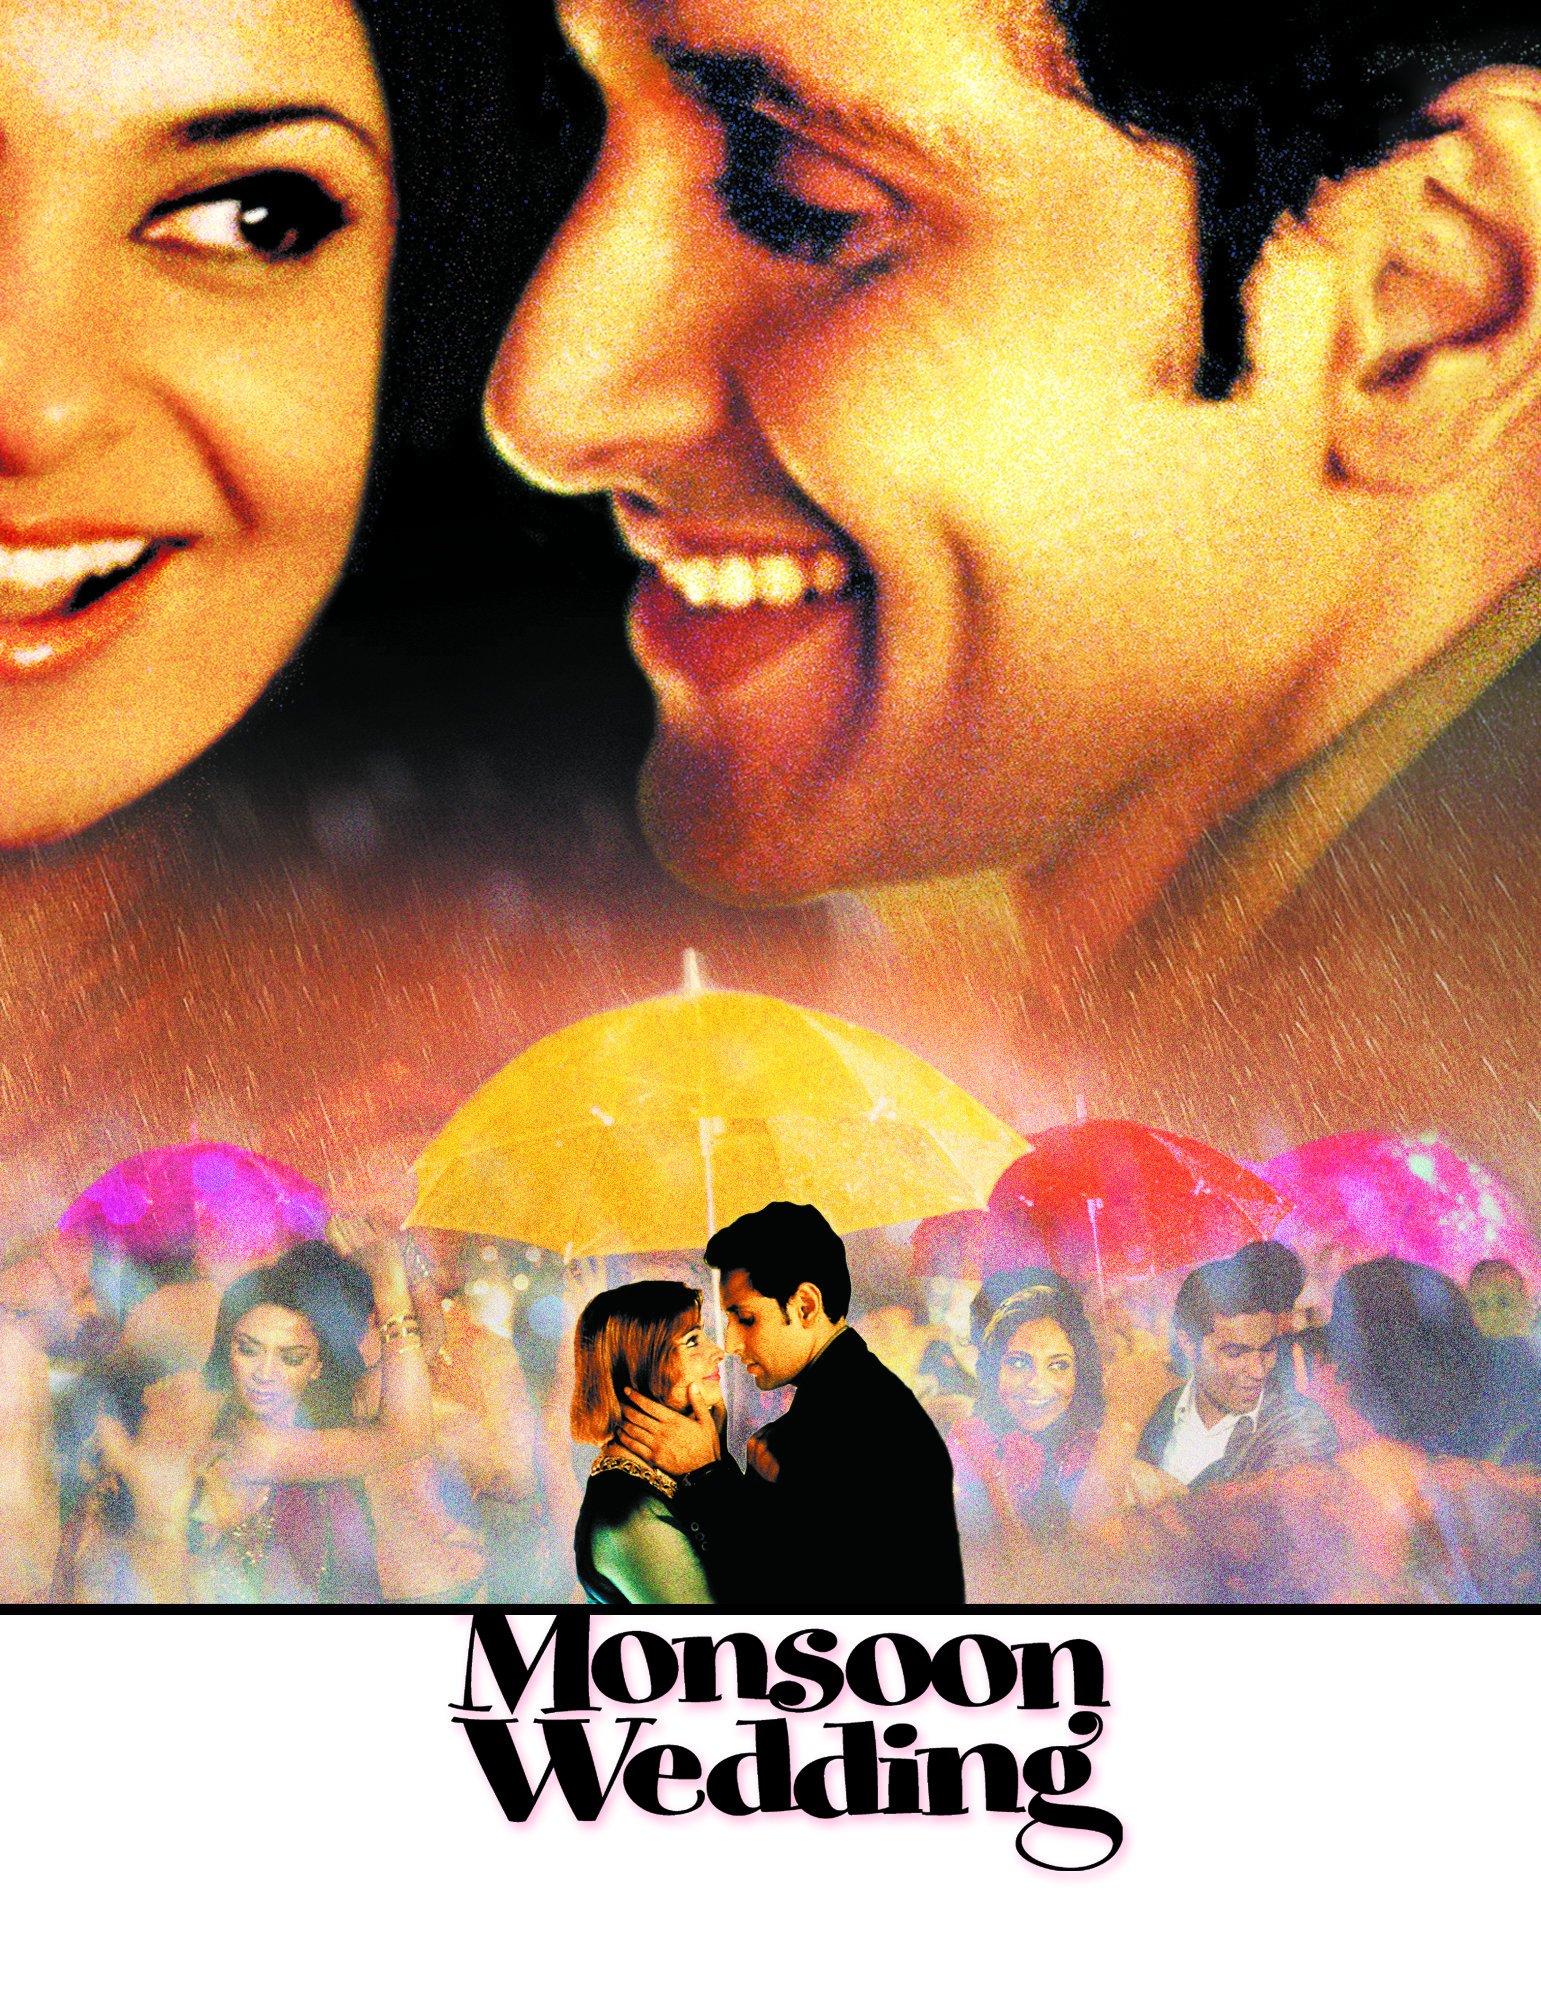 Amazon.com: Watch Monsoon Wedding | Prime Video